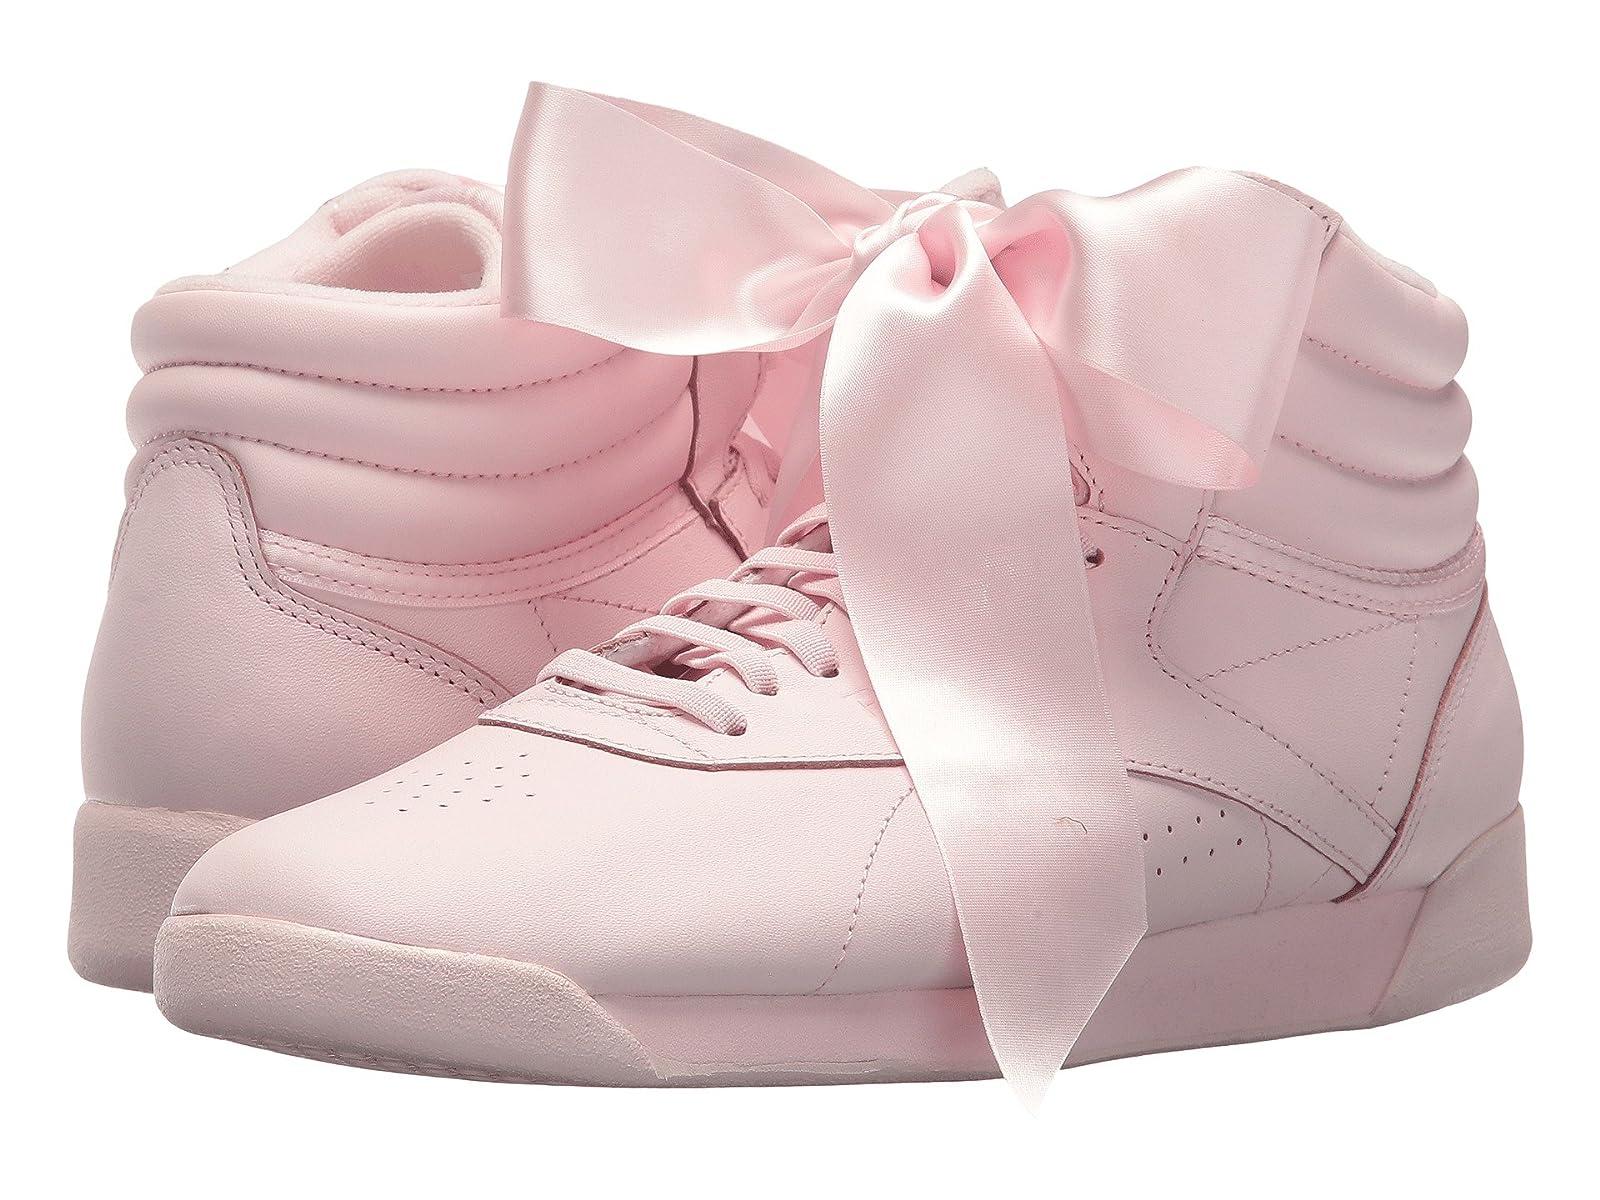 Reebok Lifestyle Freestyle Hi Satin BowCheap and distinctive eye-catching shoes